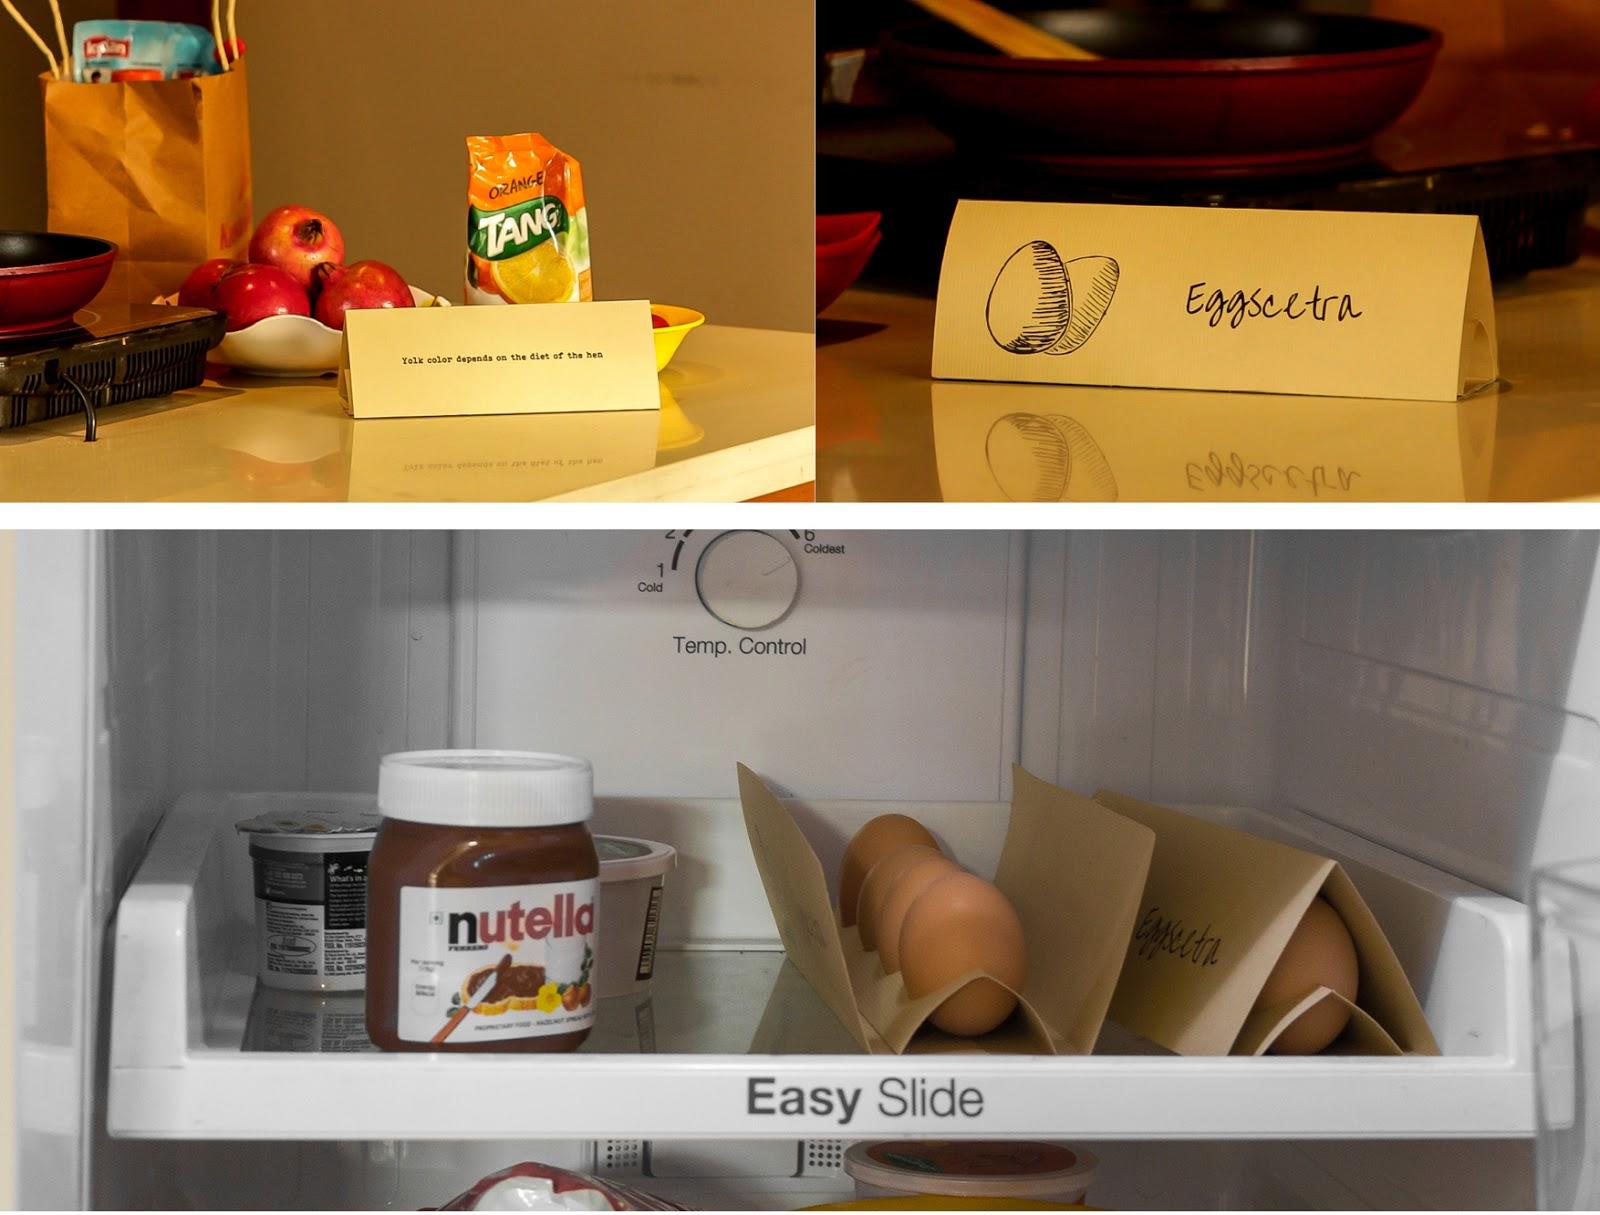 Eggscetra 蛋品创意包装